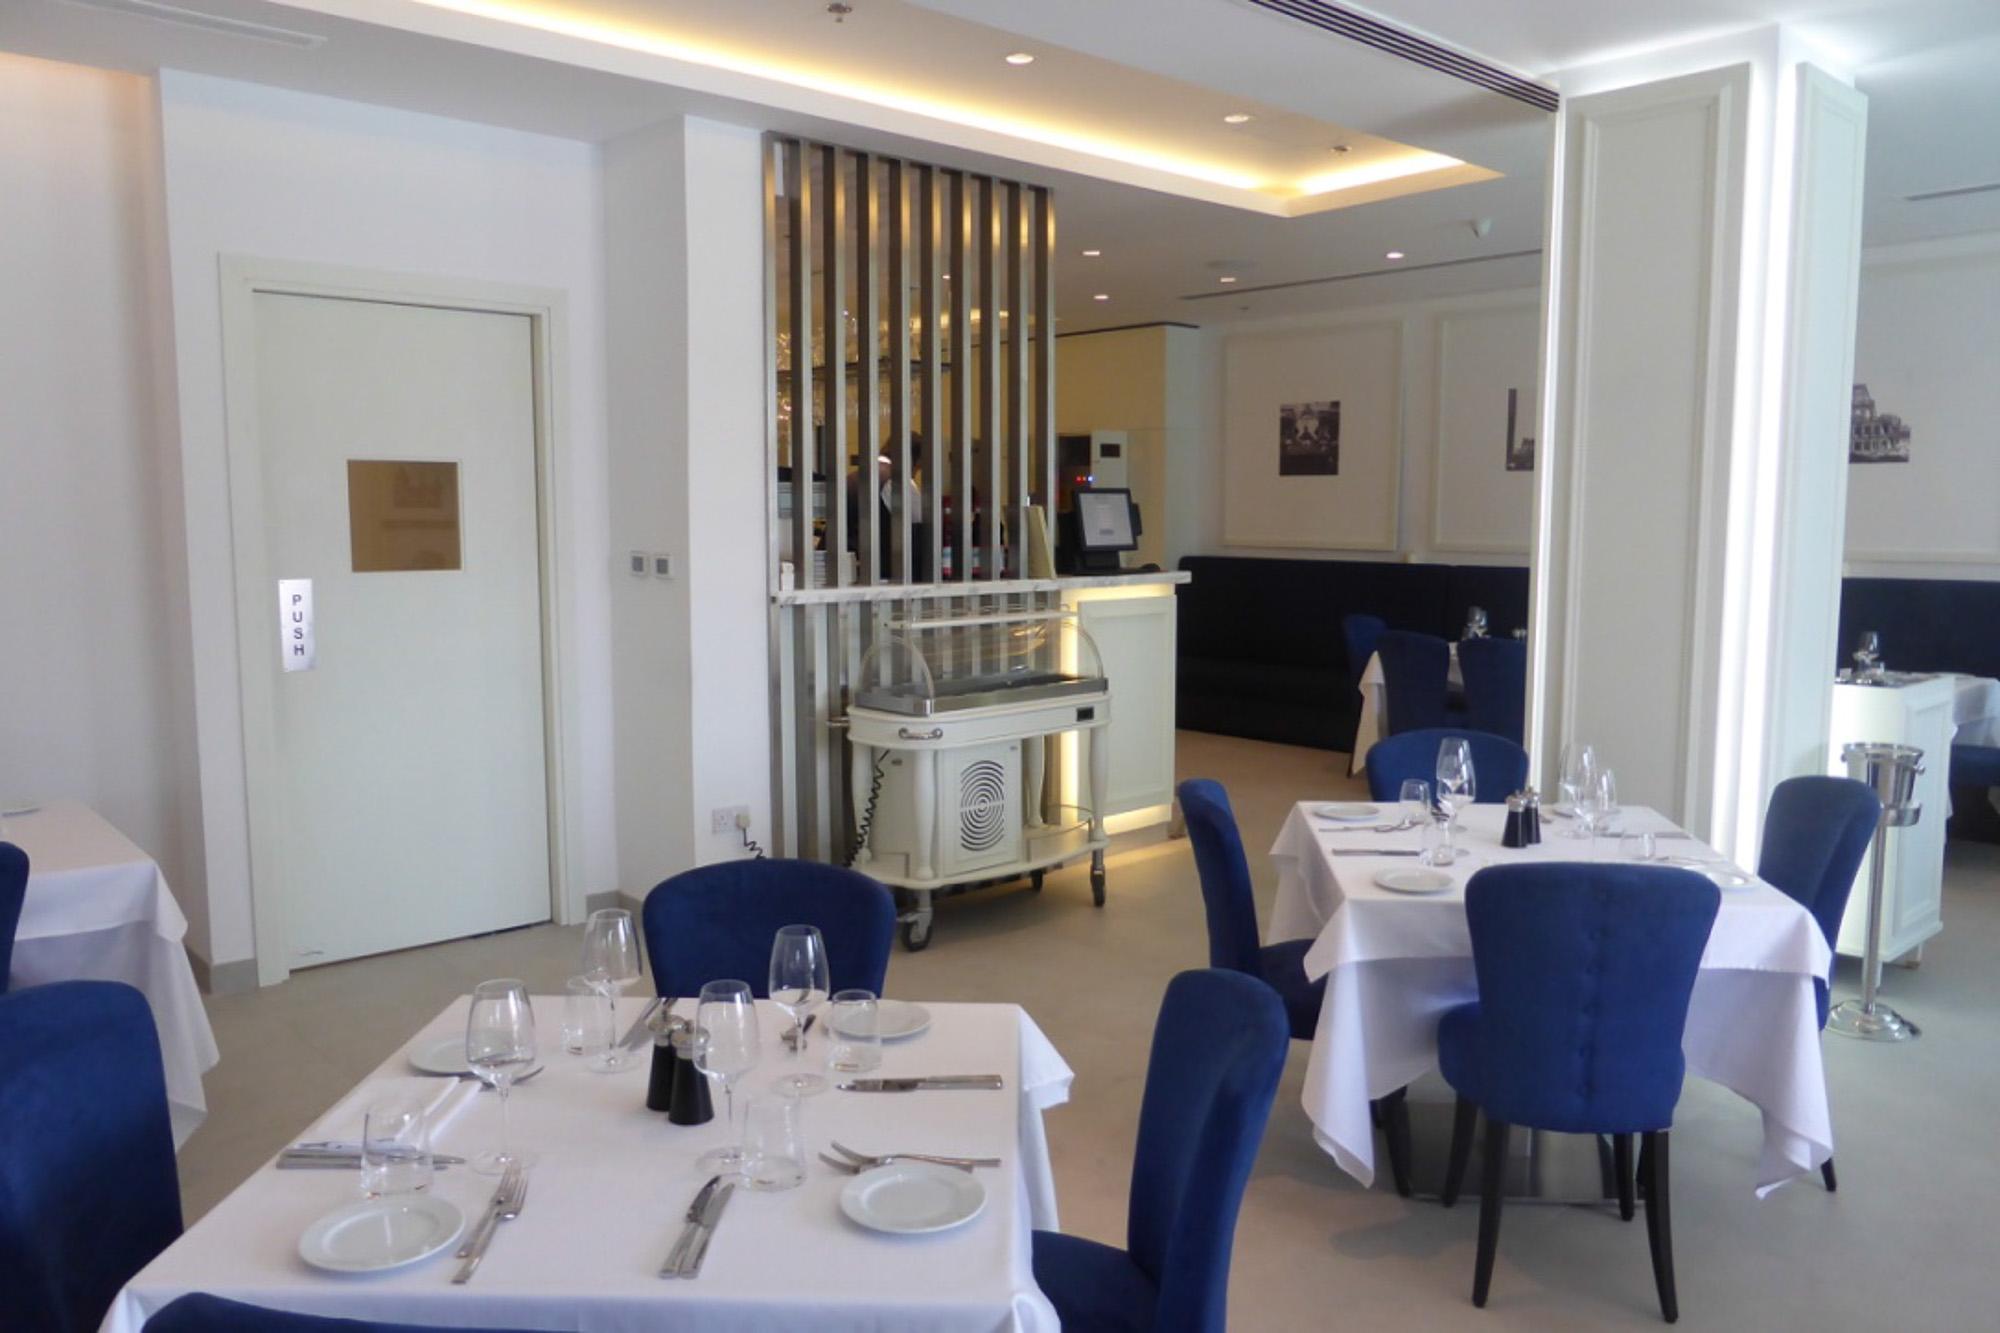 Italia_kitchen_-Bice_d-5